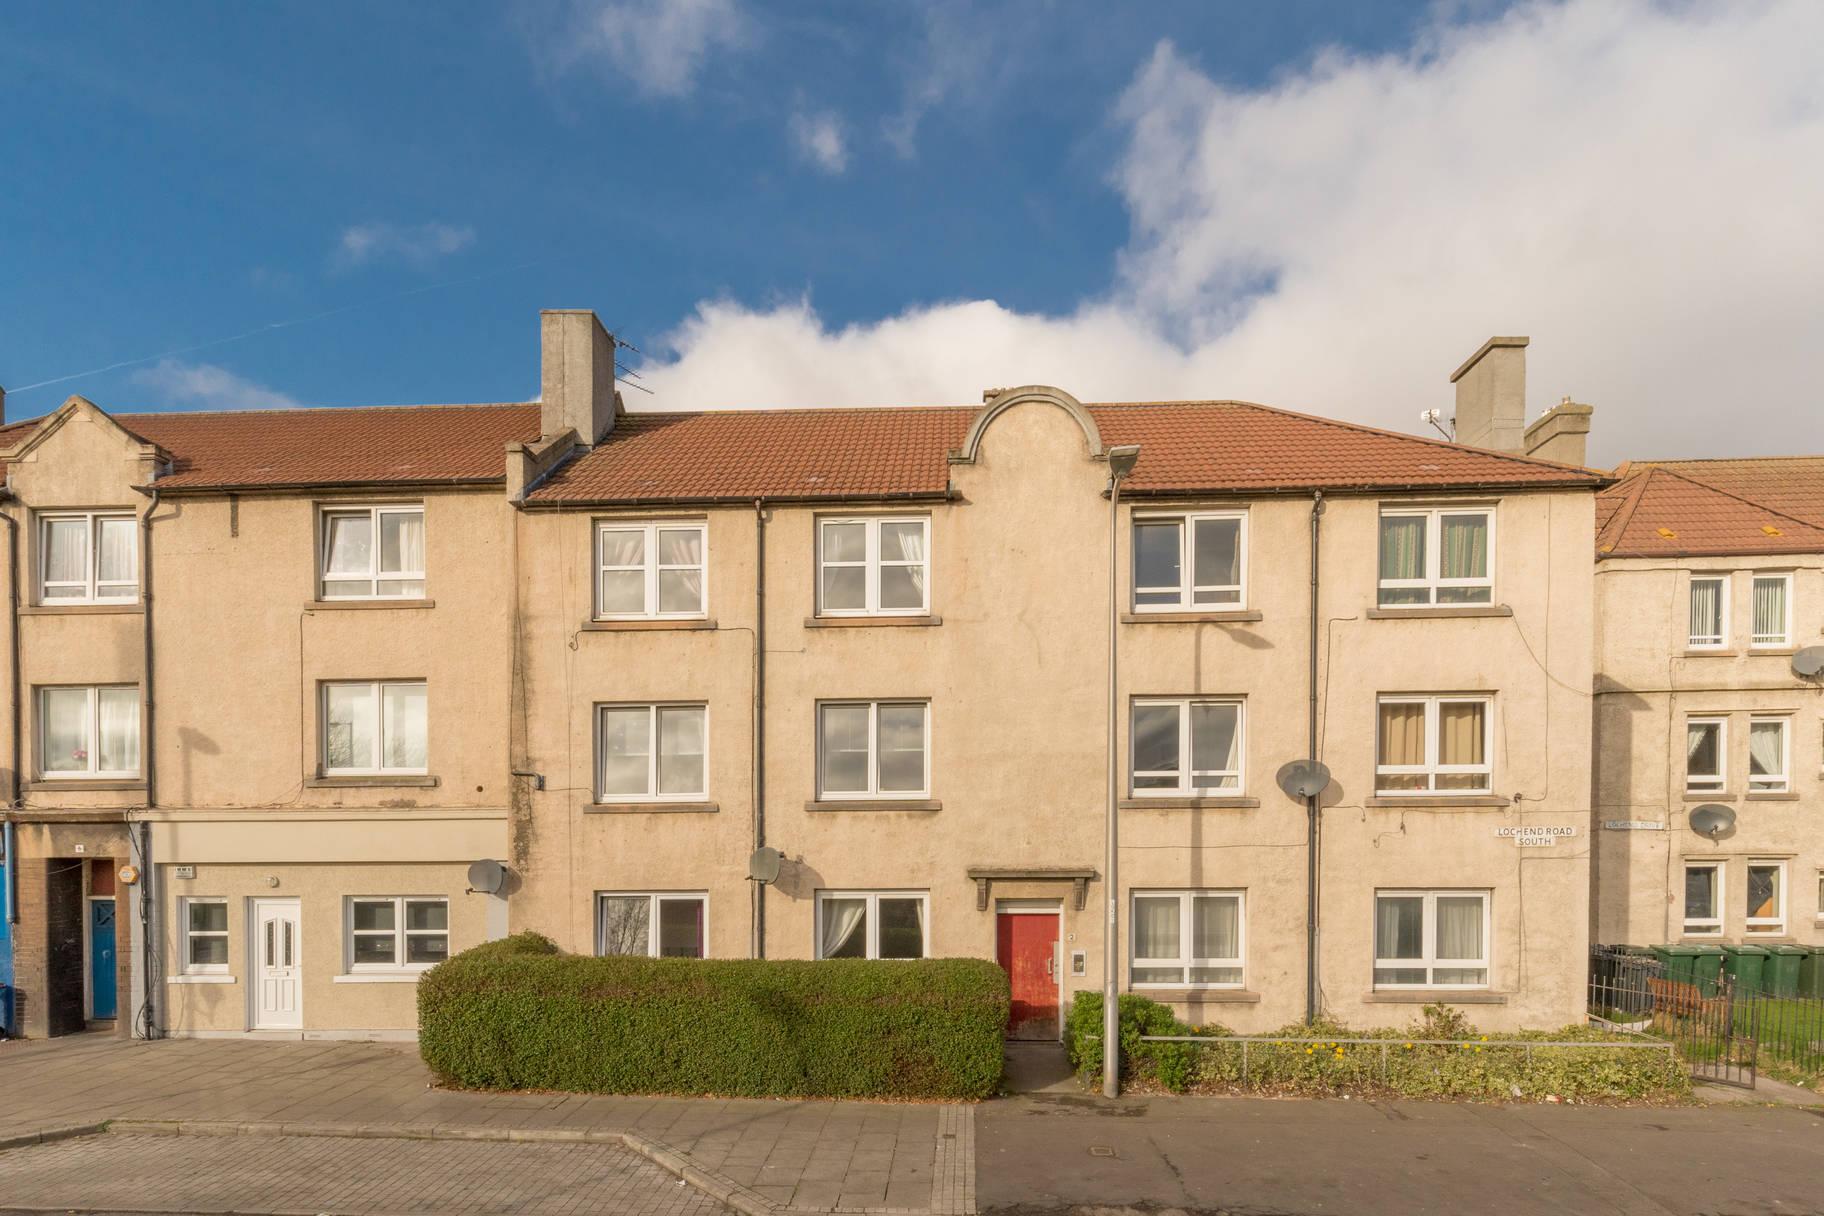 2/5 Lochend Road South, Edinburgh, EH7 6BP